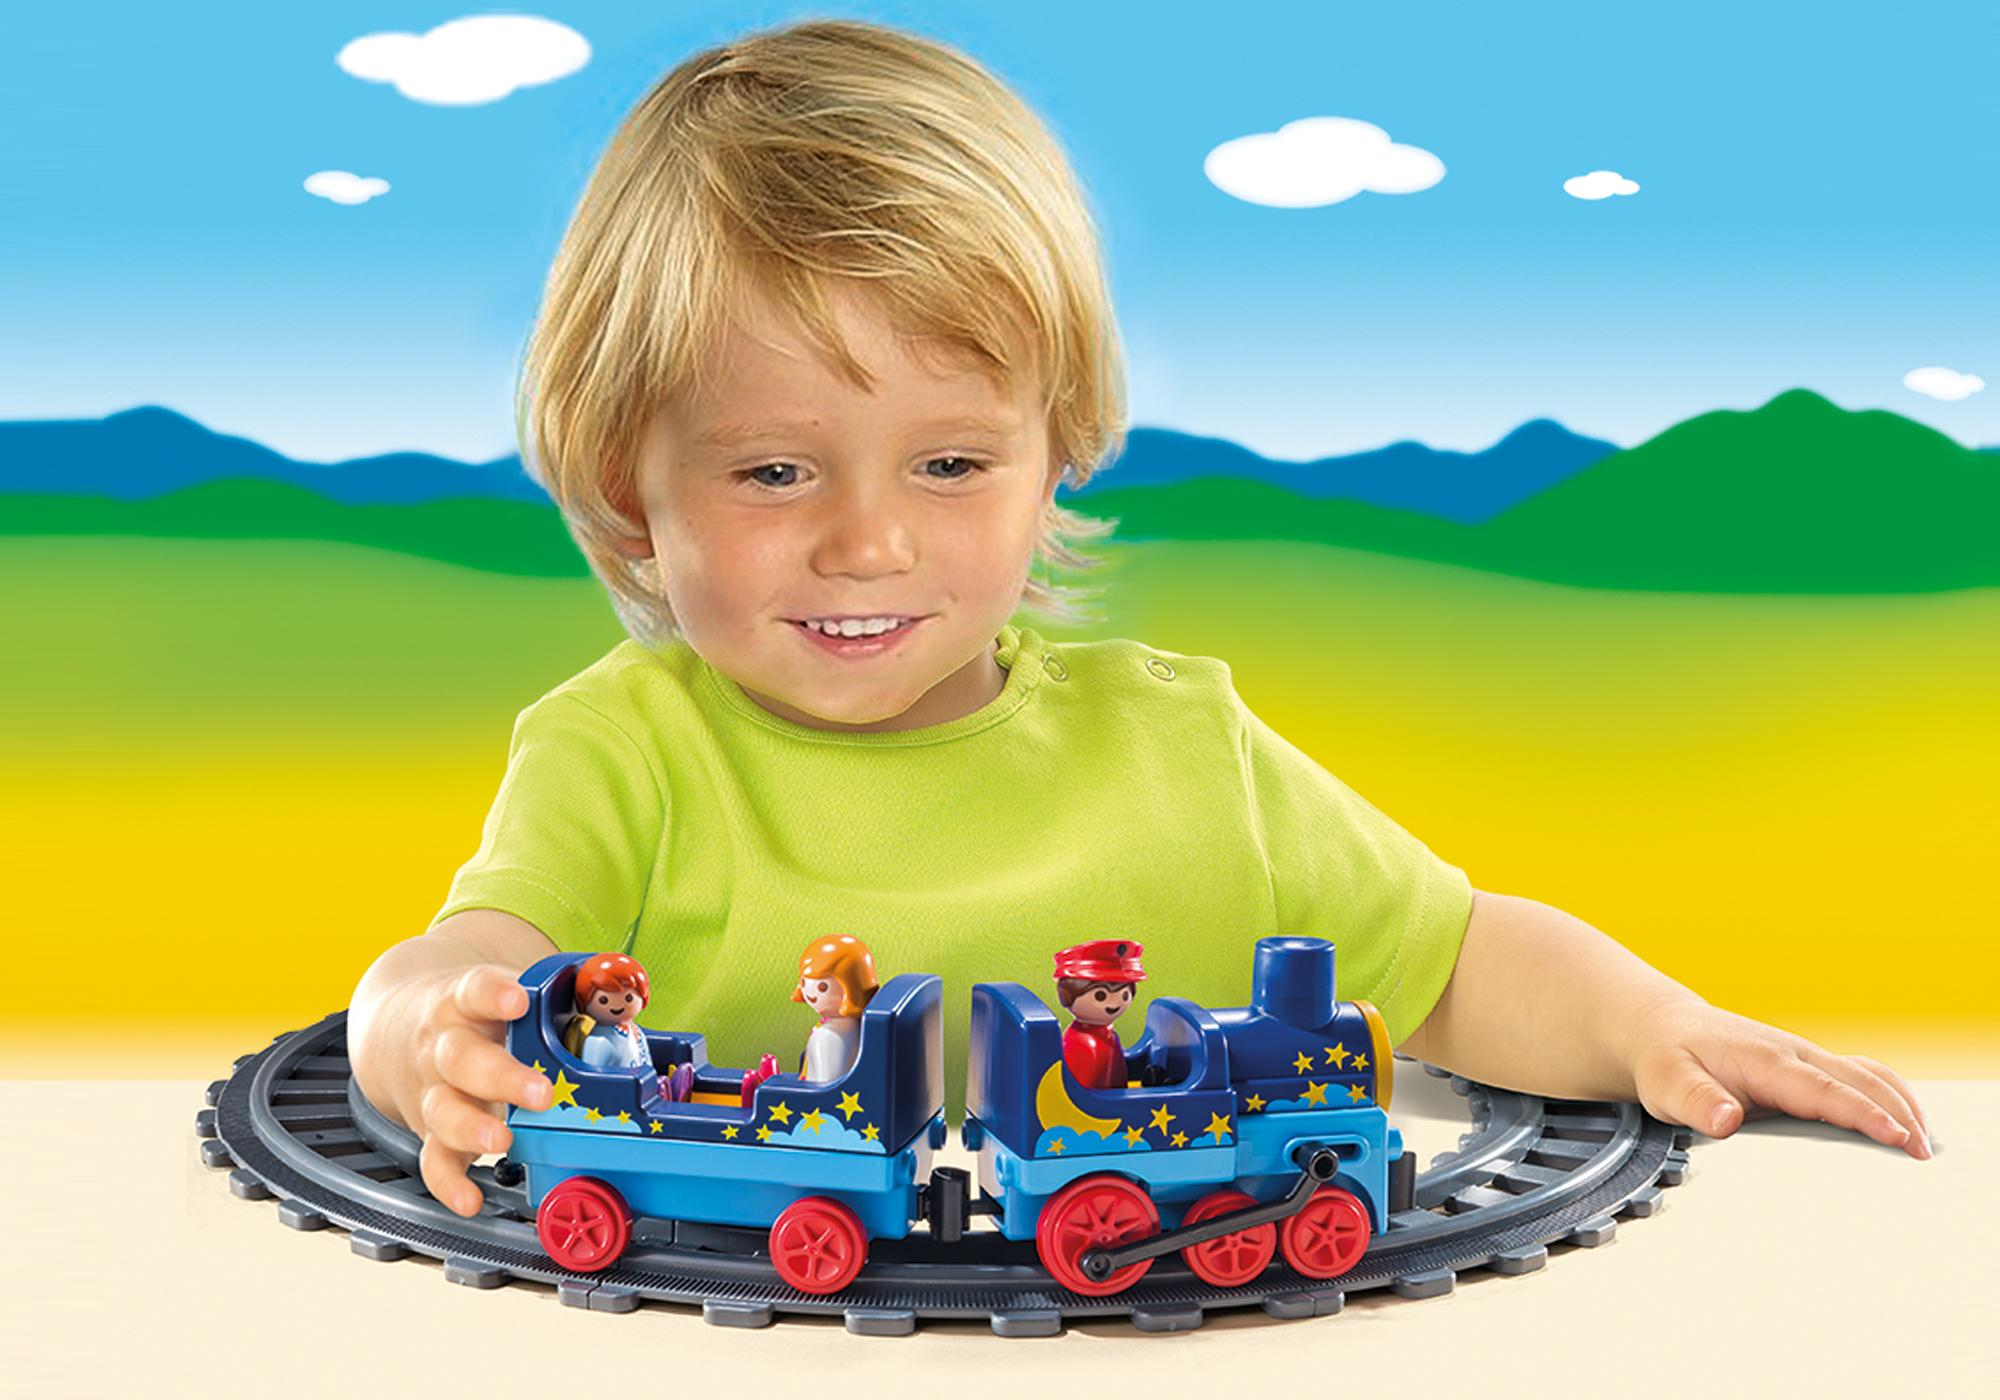 http://media.playmobil.com/i/playmobil/6880_product_extra2/Sterrentrein met passagiers